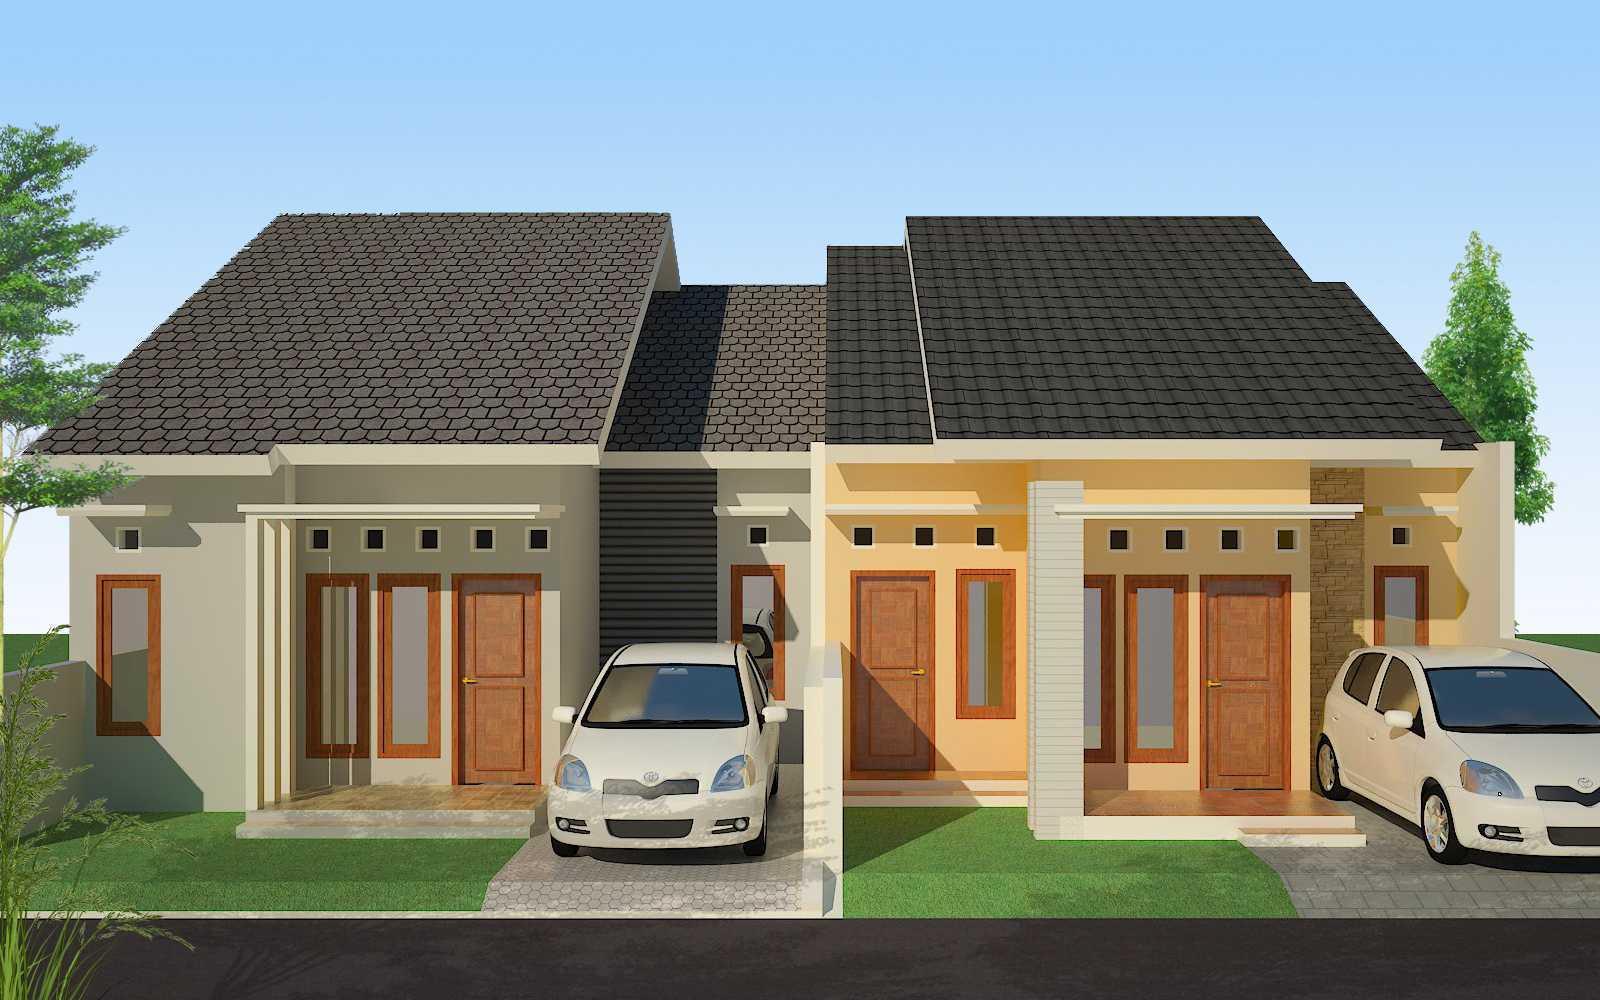 Aditia Purnomo Rumah Minimalis 2 Lampung, Indonesia Lampung, Indonesia Aditia-Purnomo-Rumah-Minimalis   61324